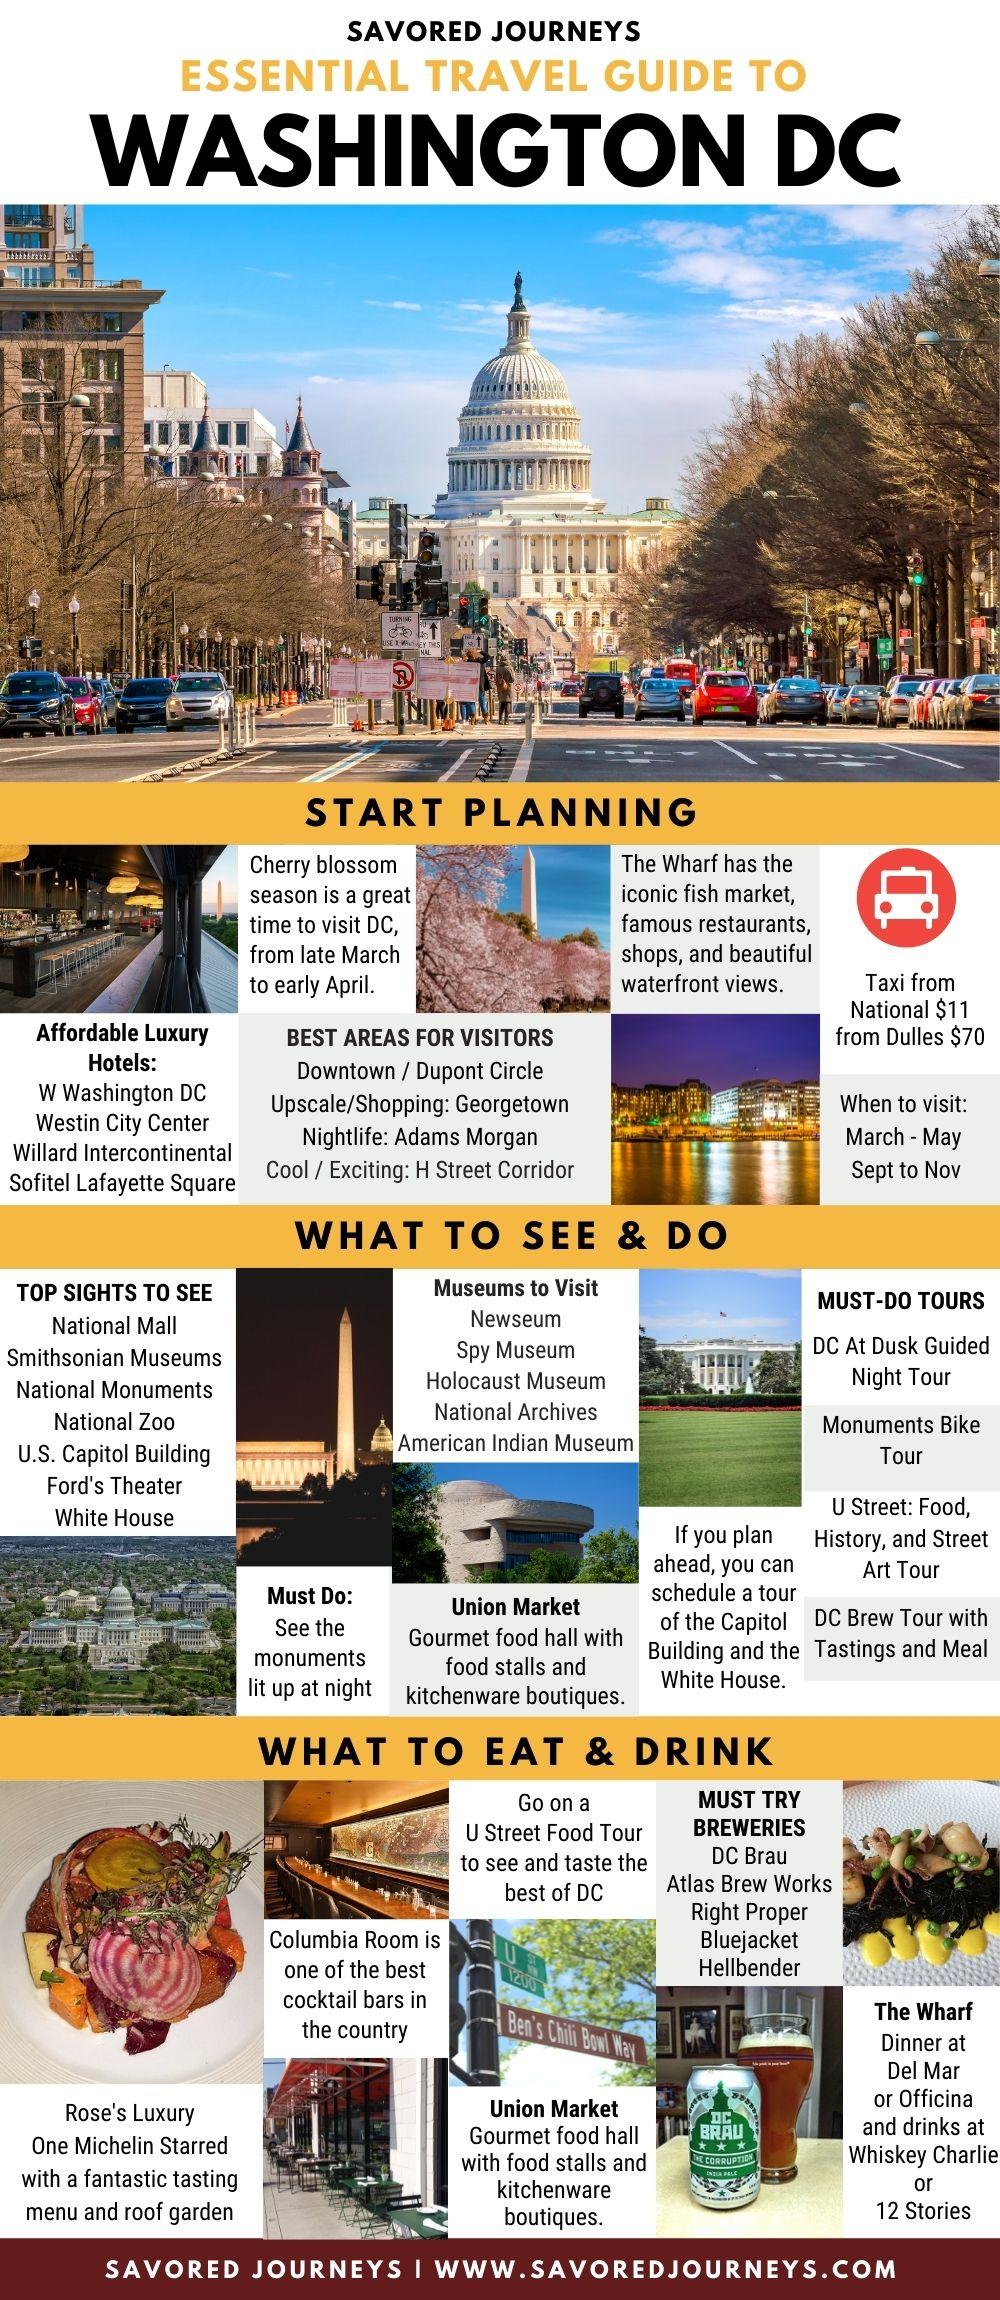 Washington DC Essential Travel Guide